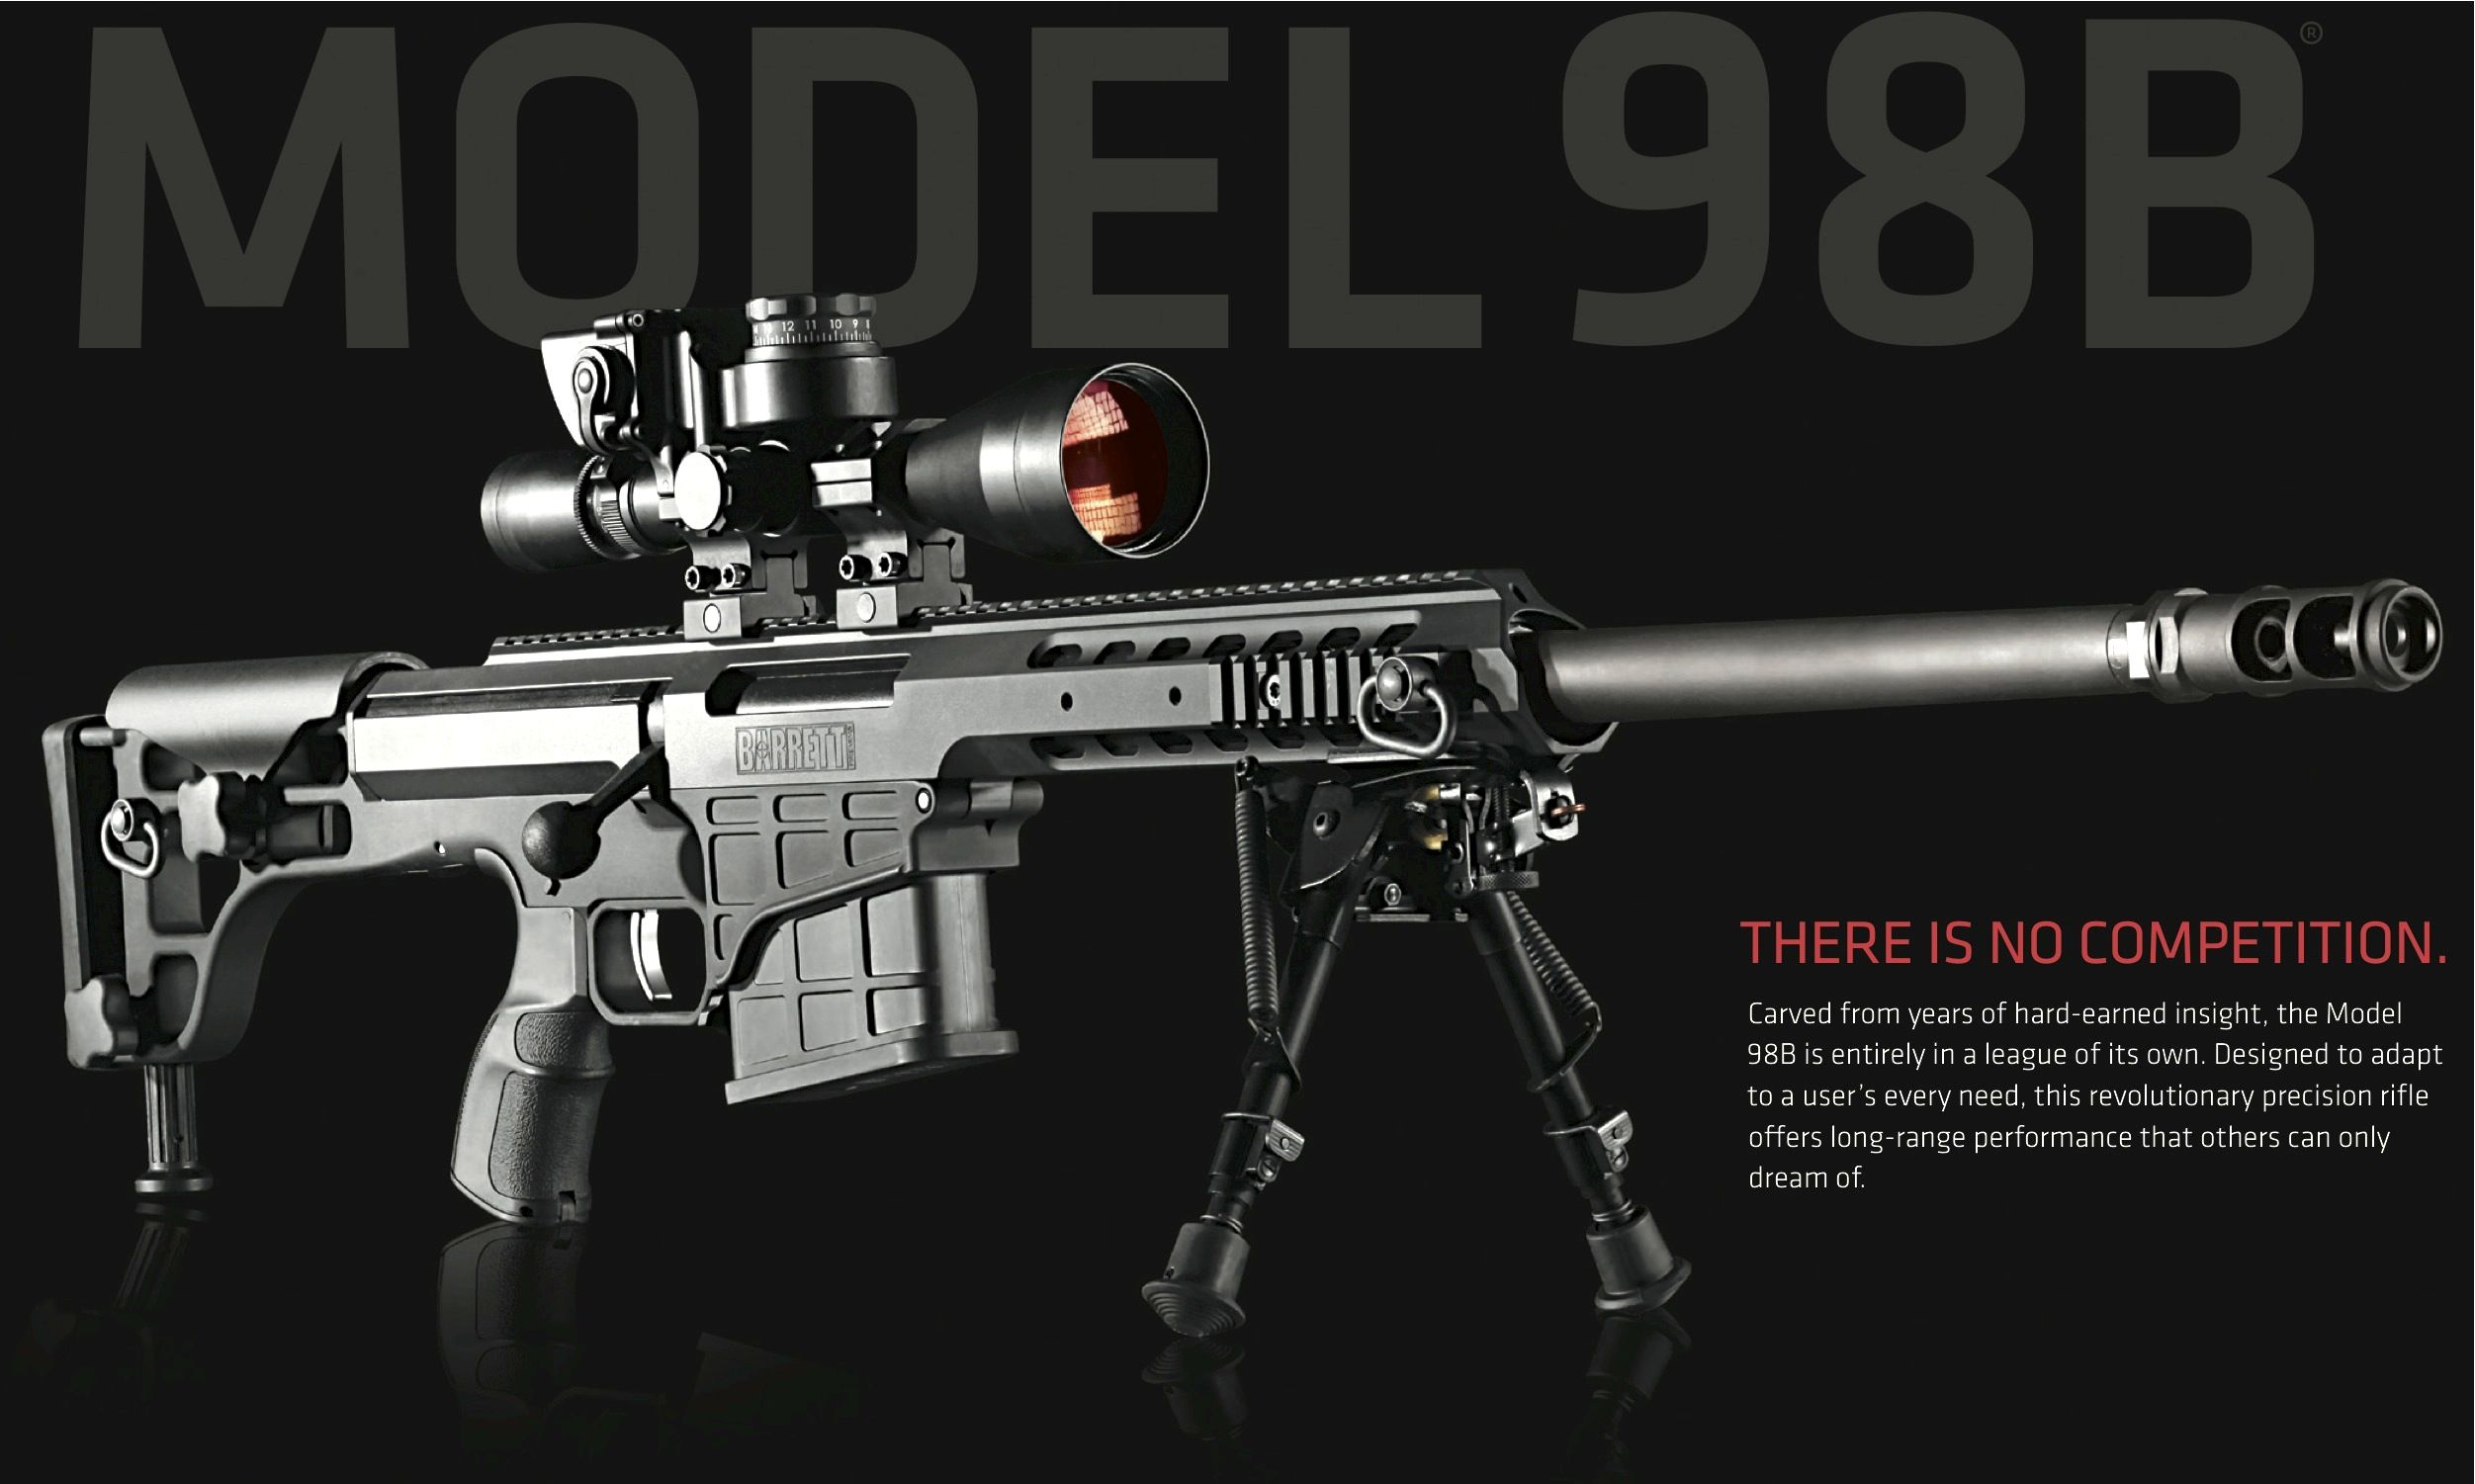 Barrett M98b 338 Lapua Magnum Sniper Rifle Guns